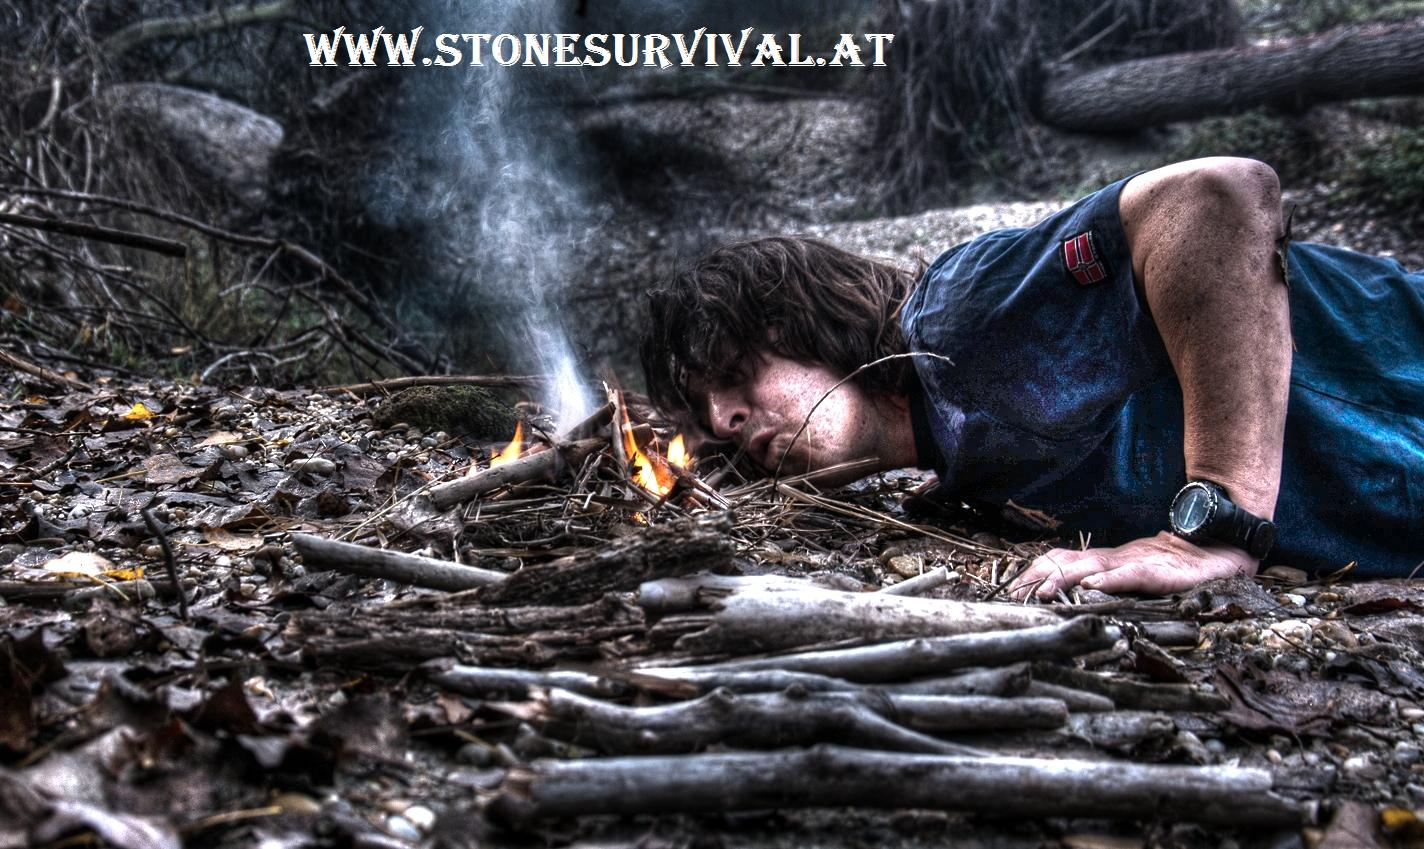 Stonesurvival